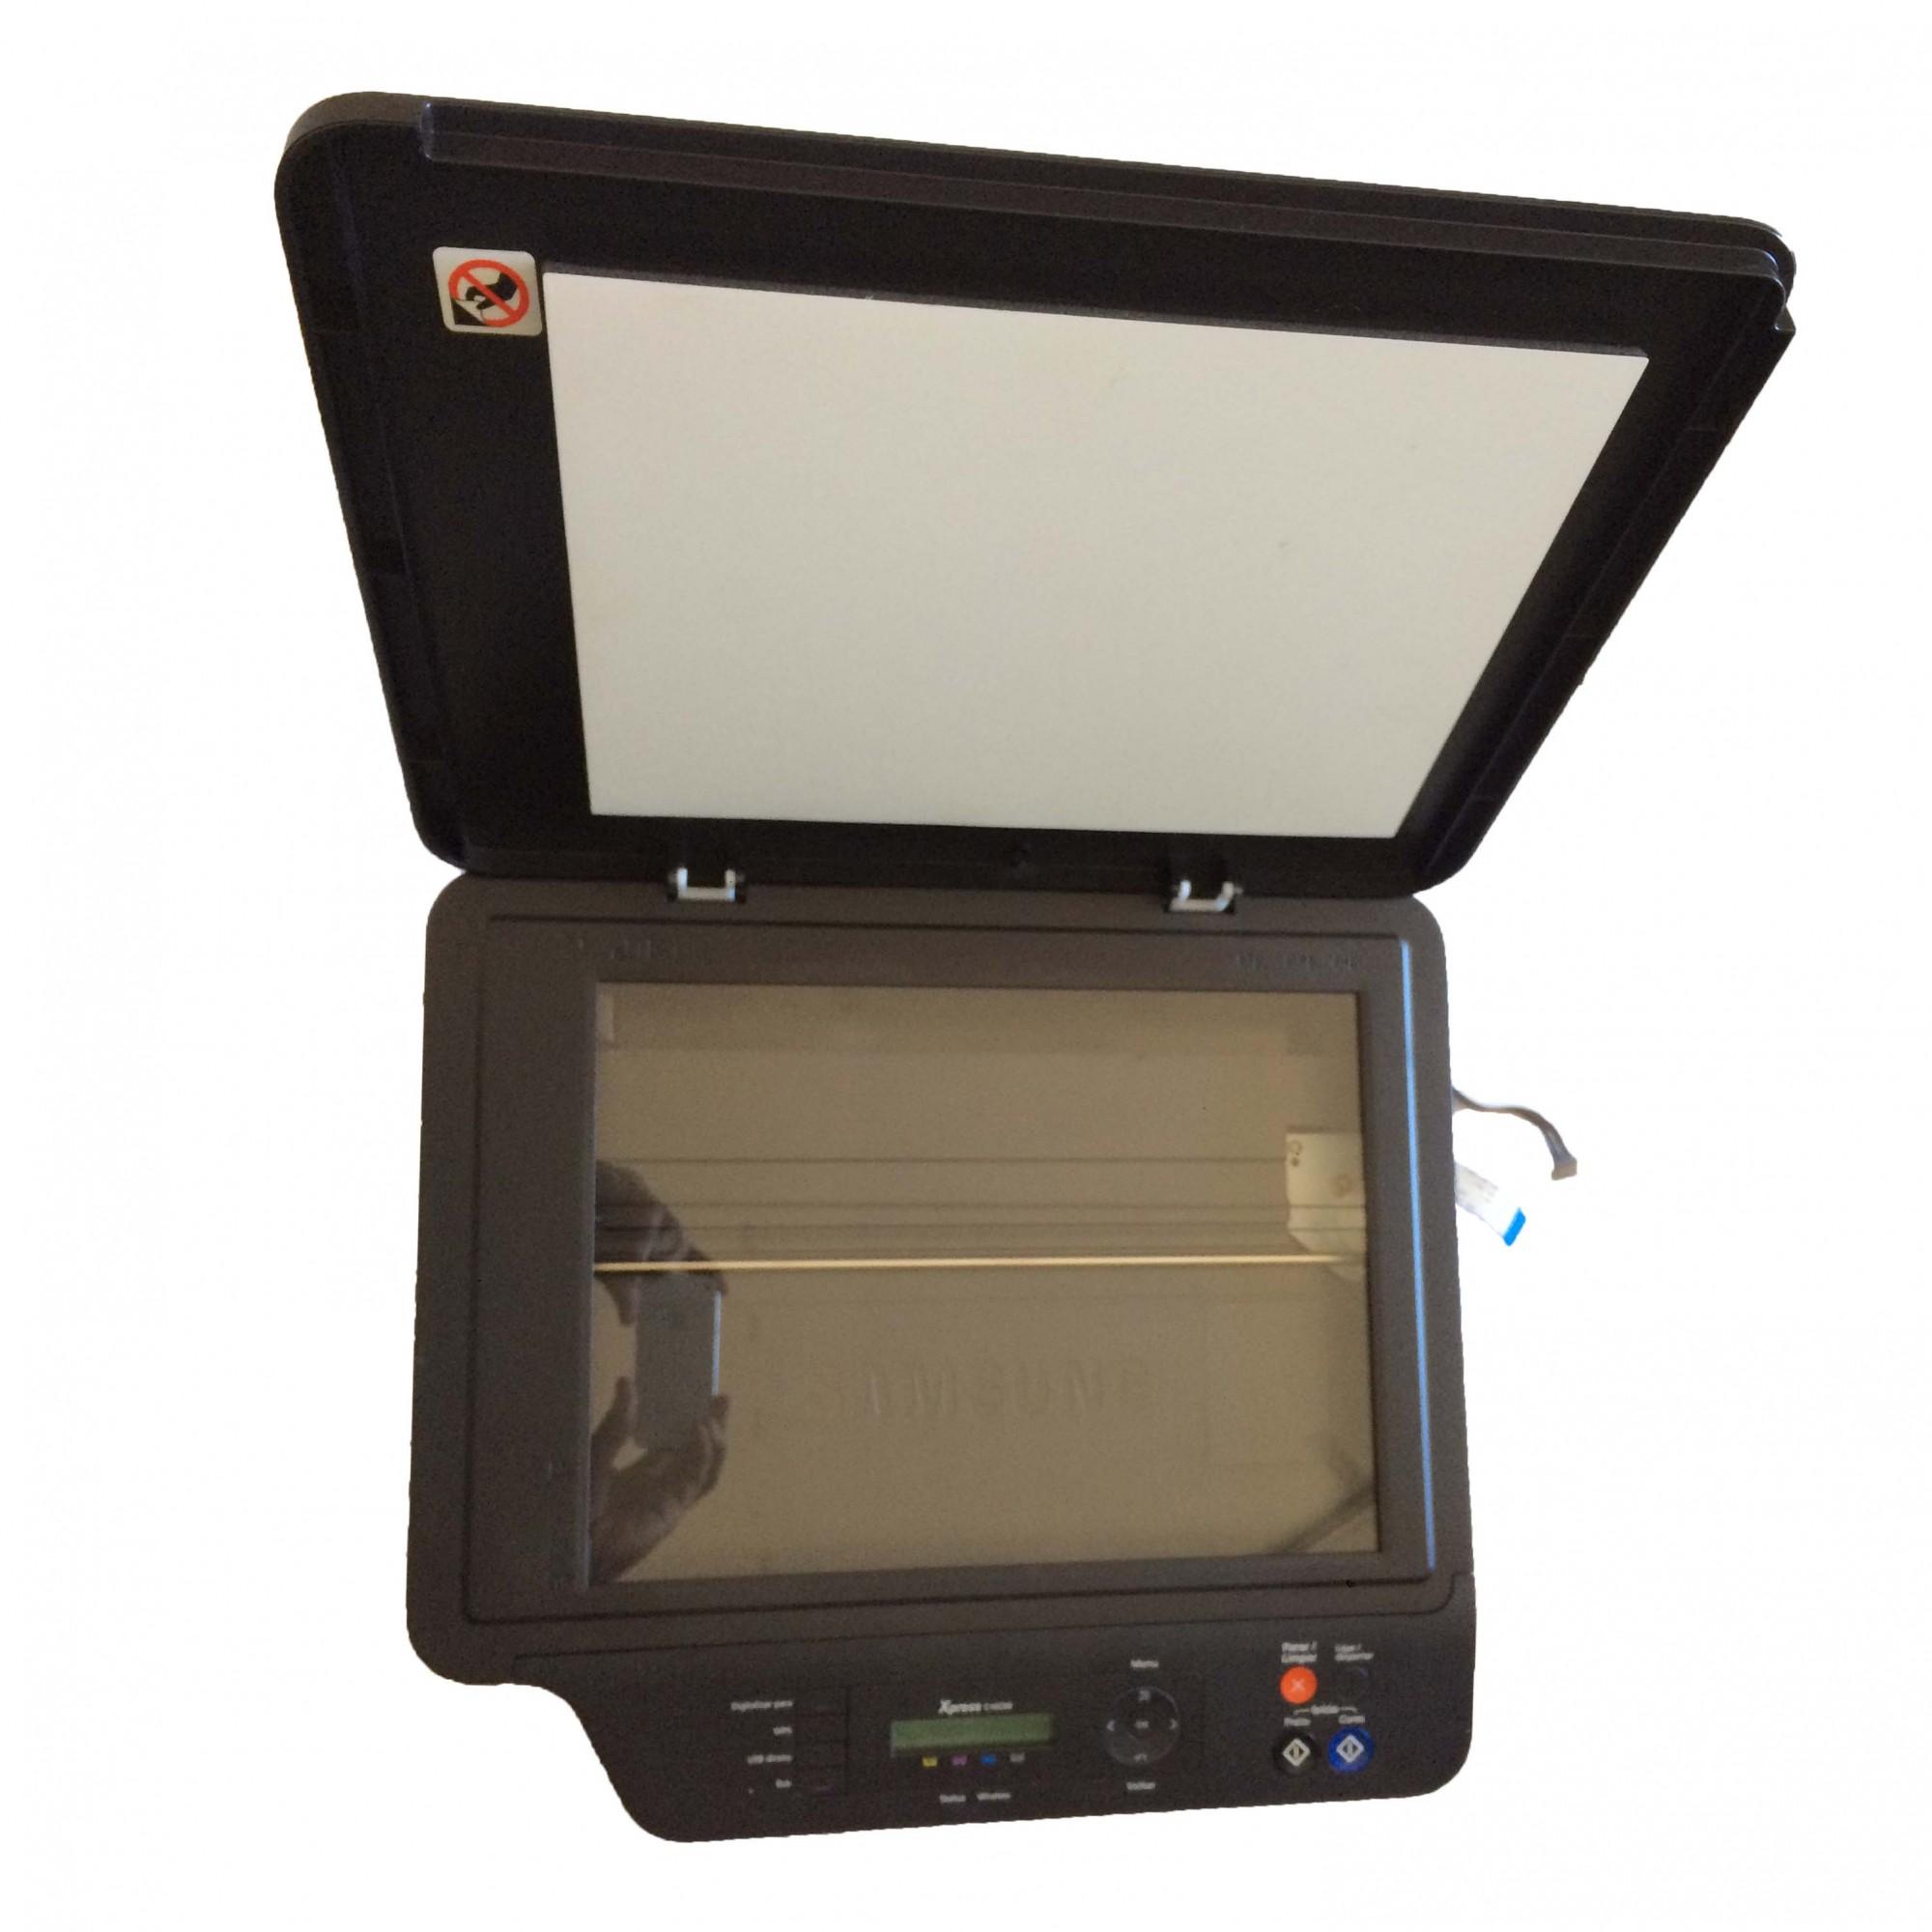 Scanner Completo + Painél Funções e Cabo Flat Multifuncional Samsung Color Xpress C460W PN:CNK1JC9704178YALZEF610154 - Retirado